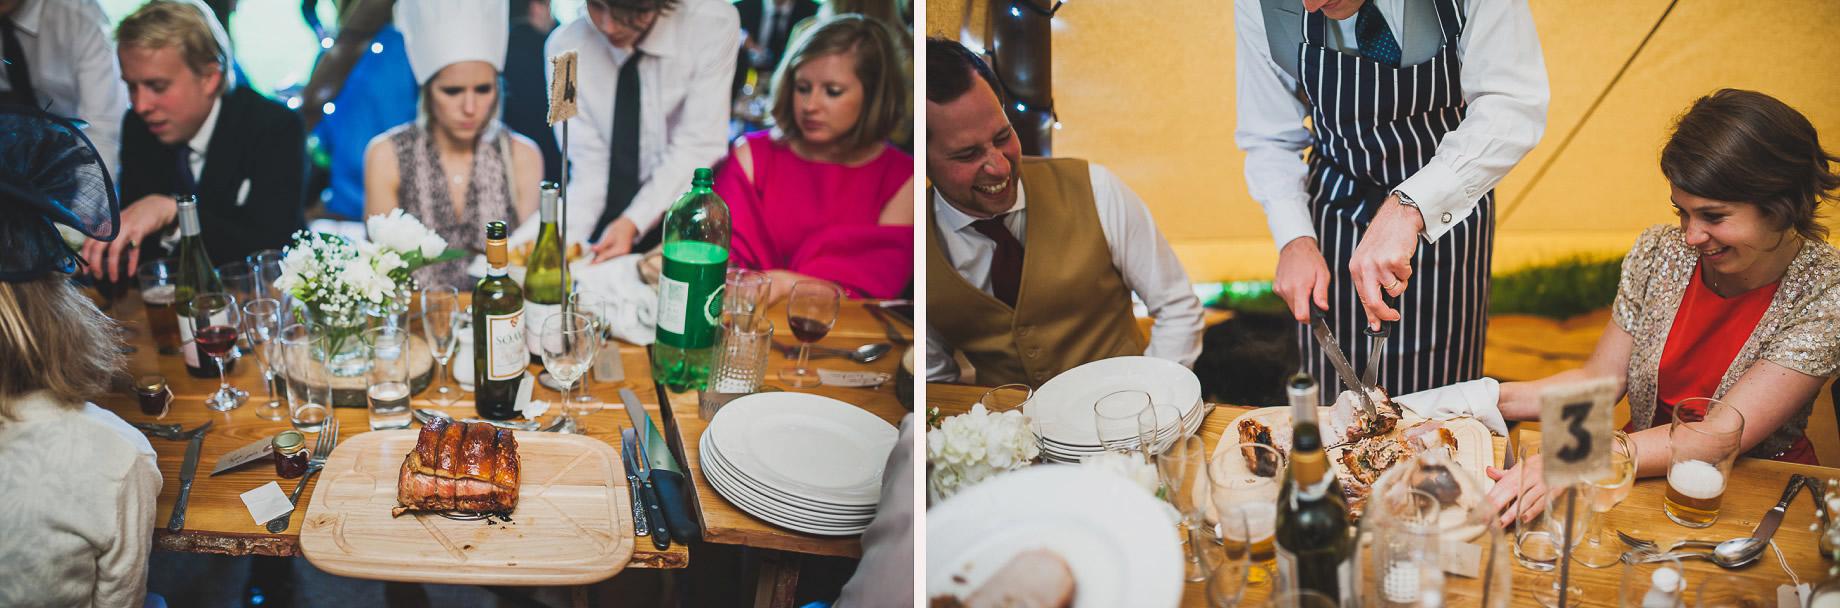 Julia and Simon's Wedding at Yealand Manor 138